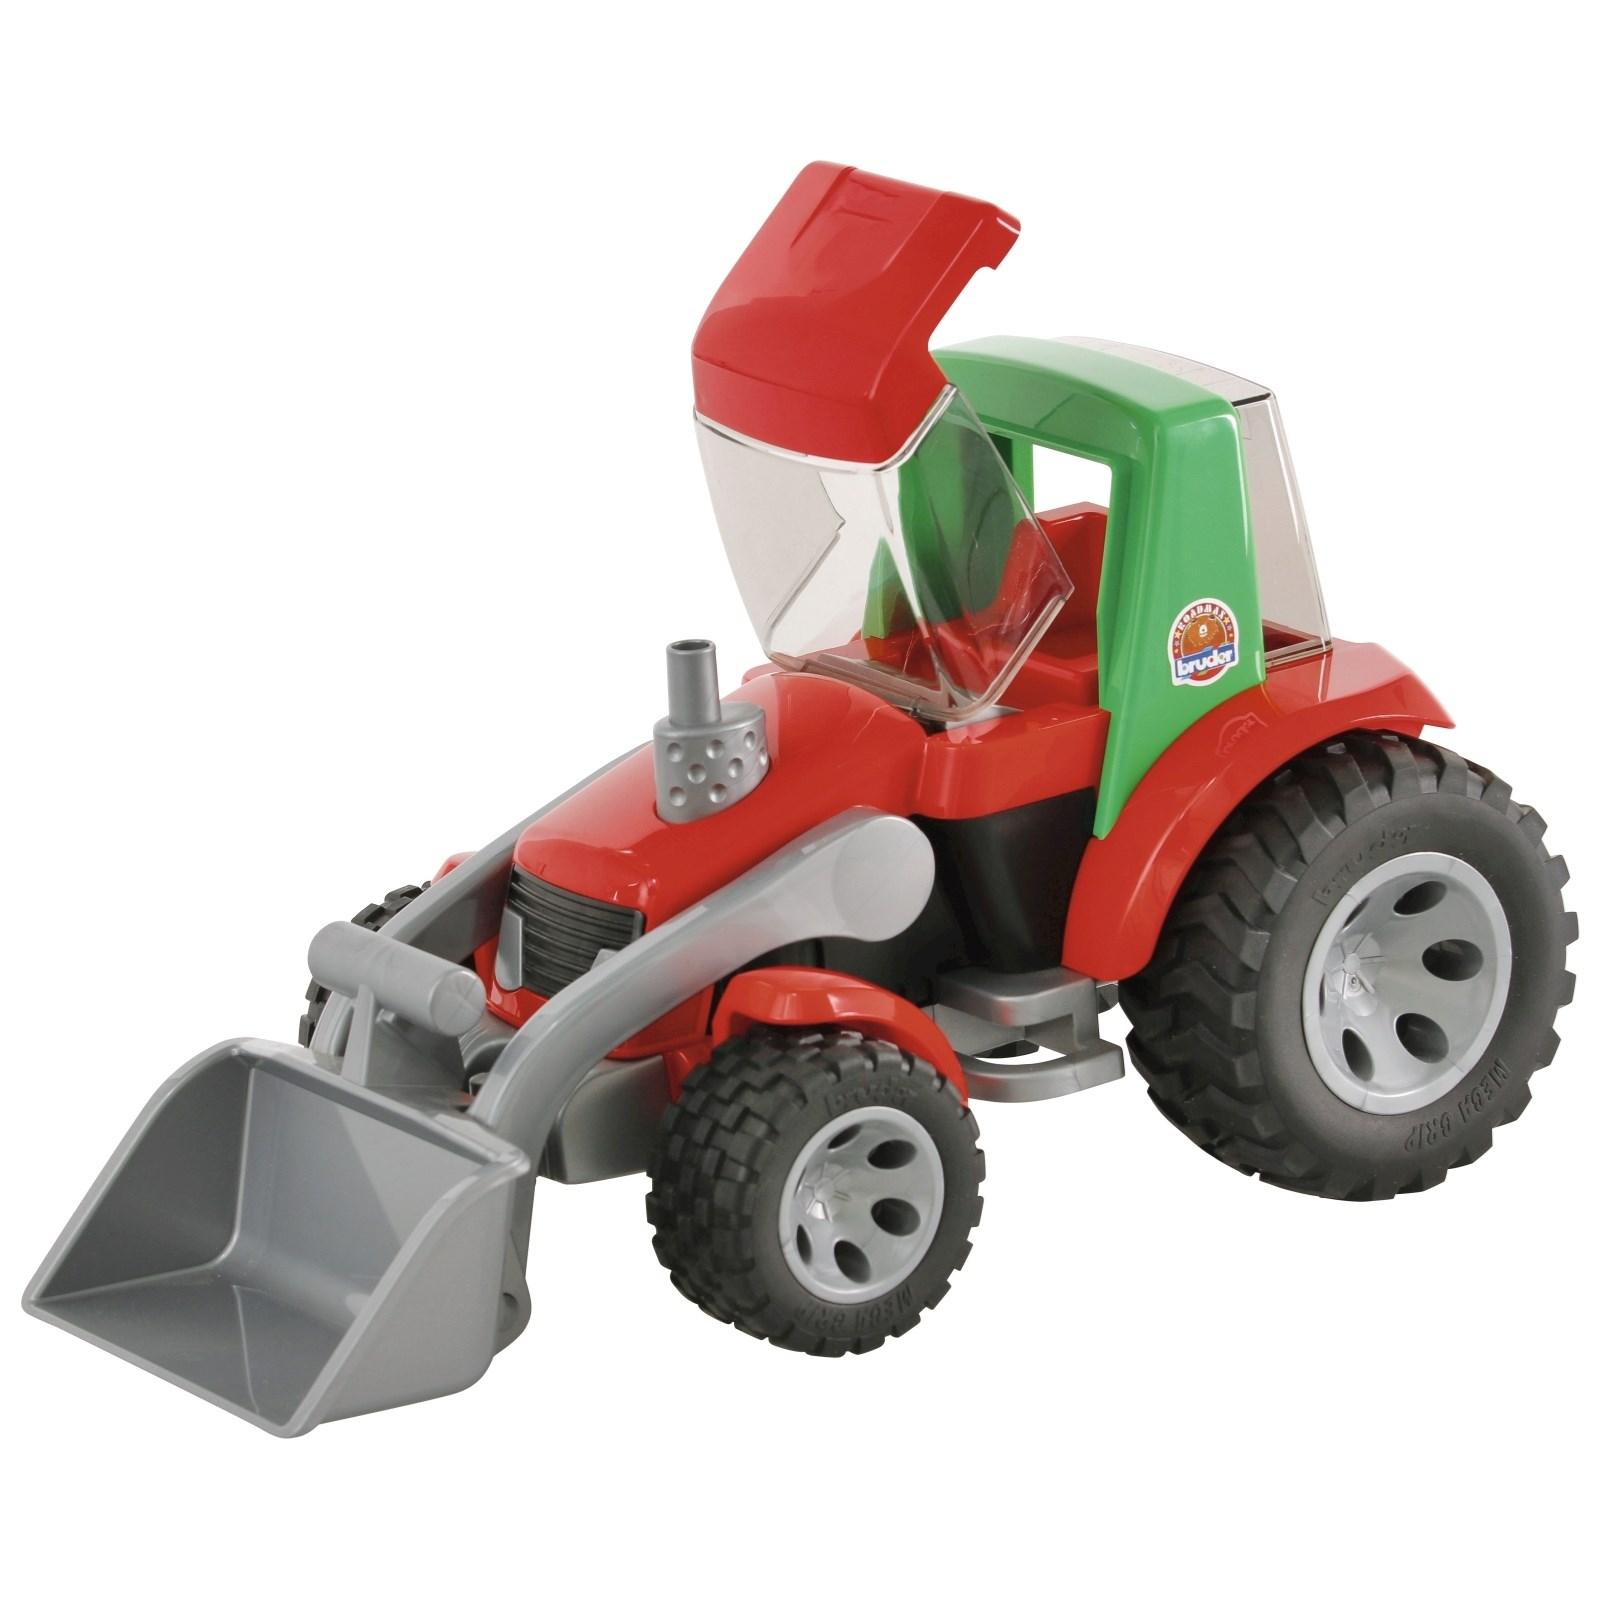 traktor mit frontlader roadmax kinderspielzeug indoor. Black Bedroom Furniture Sets. Home Design Ideas